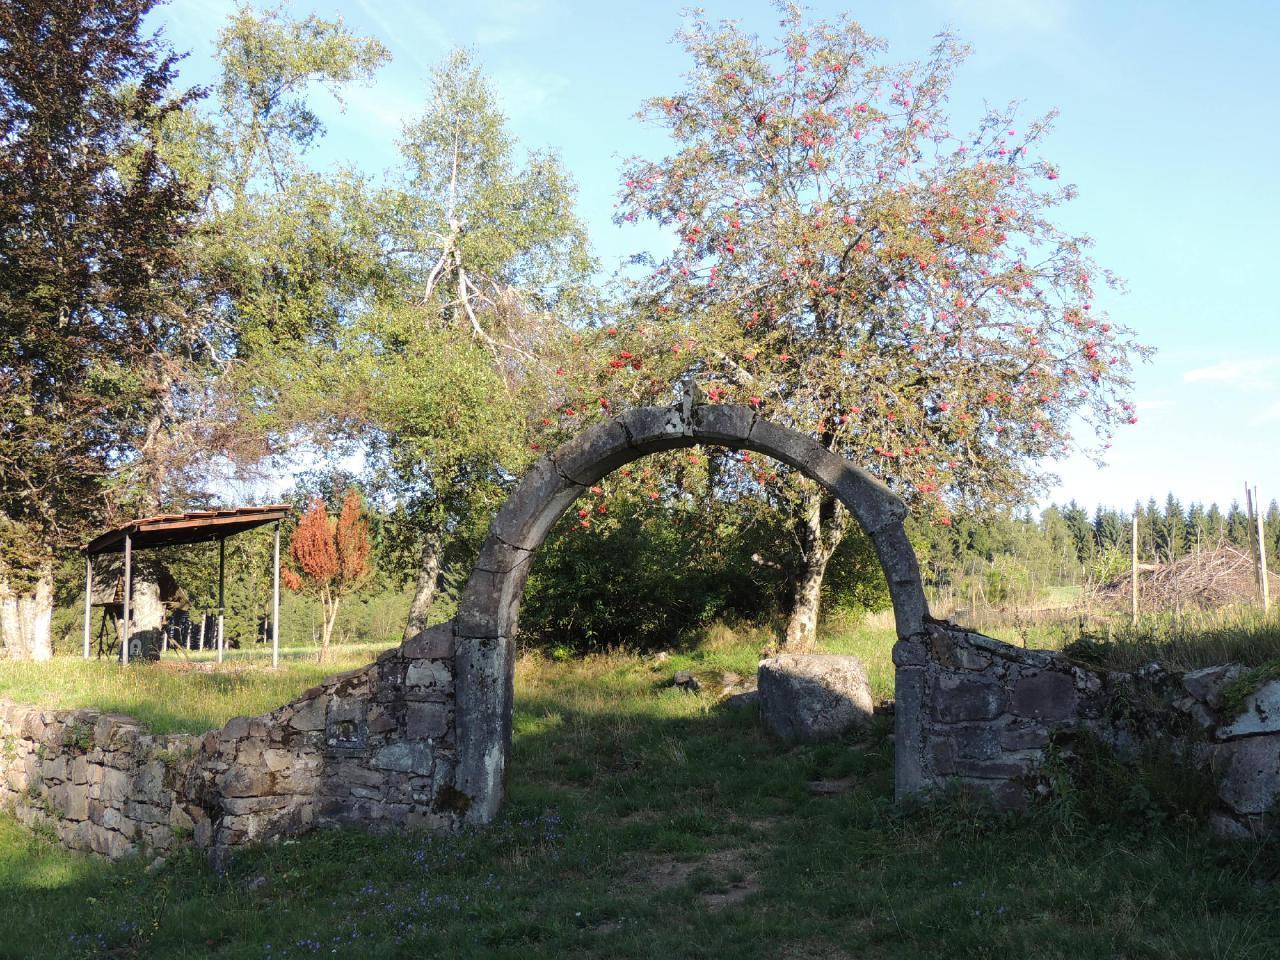 Ferienhaus Steinhäuschen Shila, im Naturparc der Vogesen,  mit Saunahaus (1717460), La Rosière, Haute-Saône, Franche-Comté, Frankreich, Bild 4